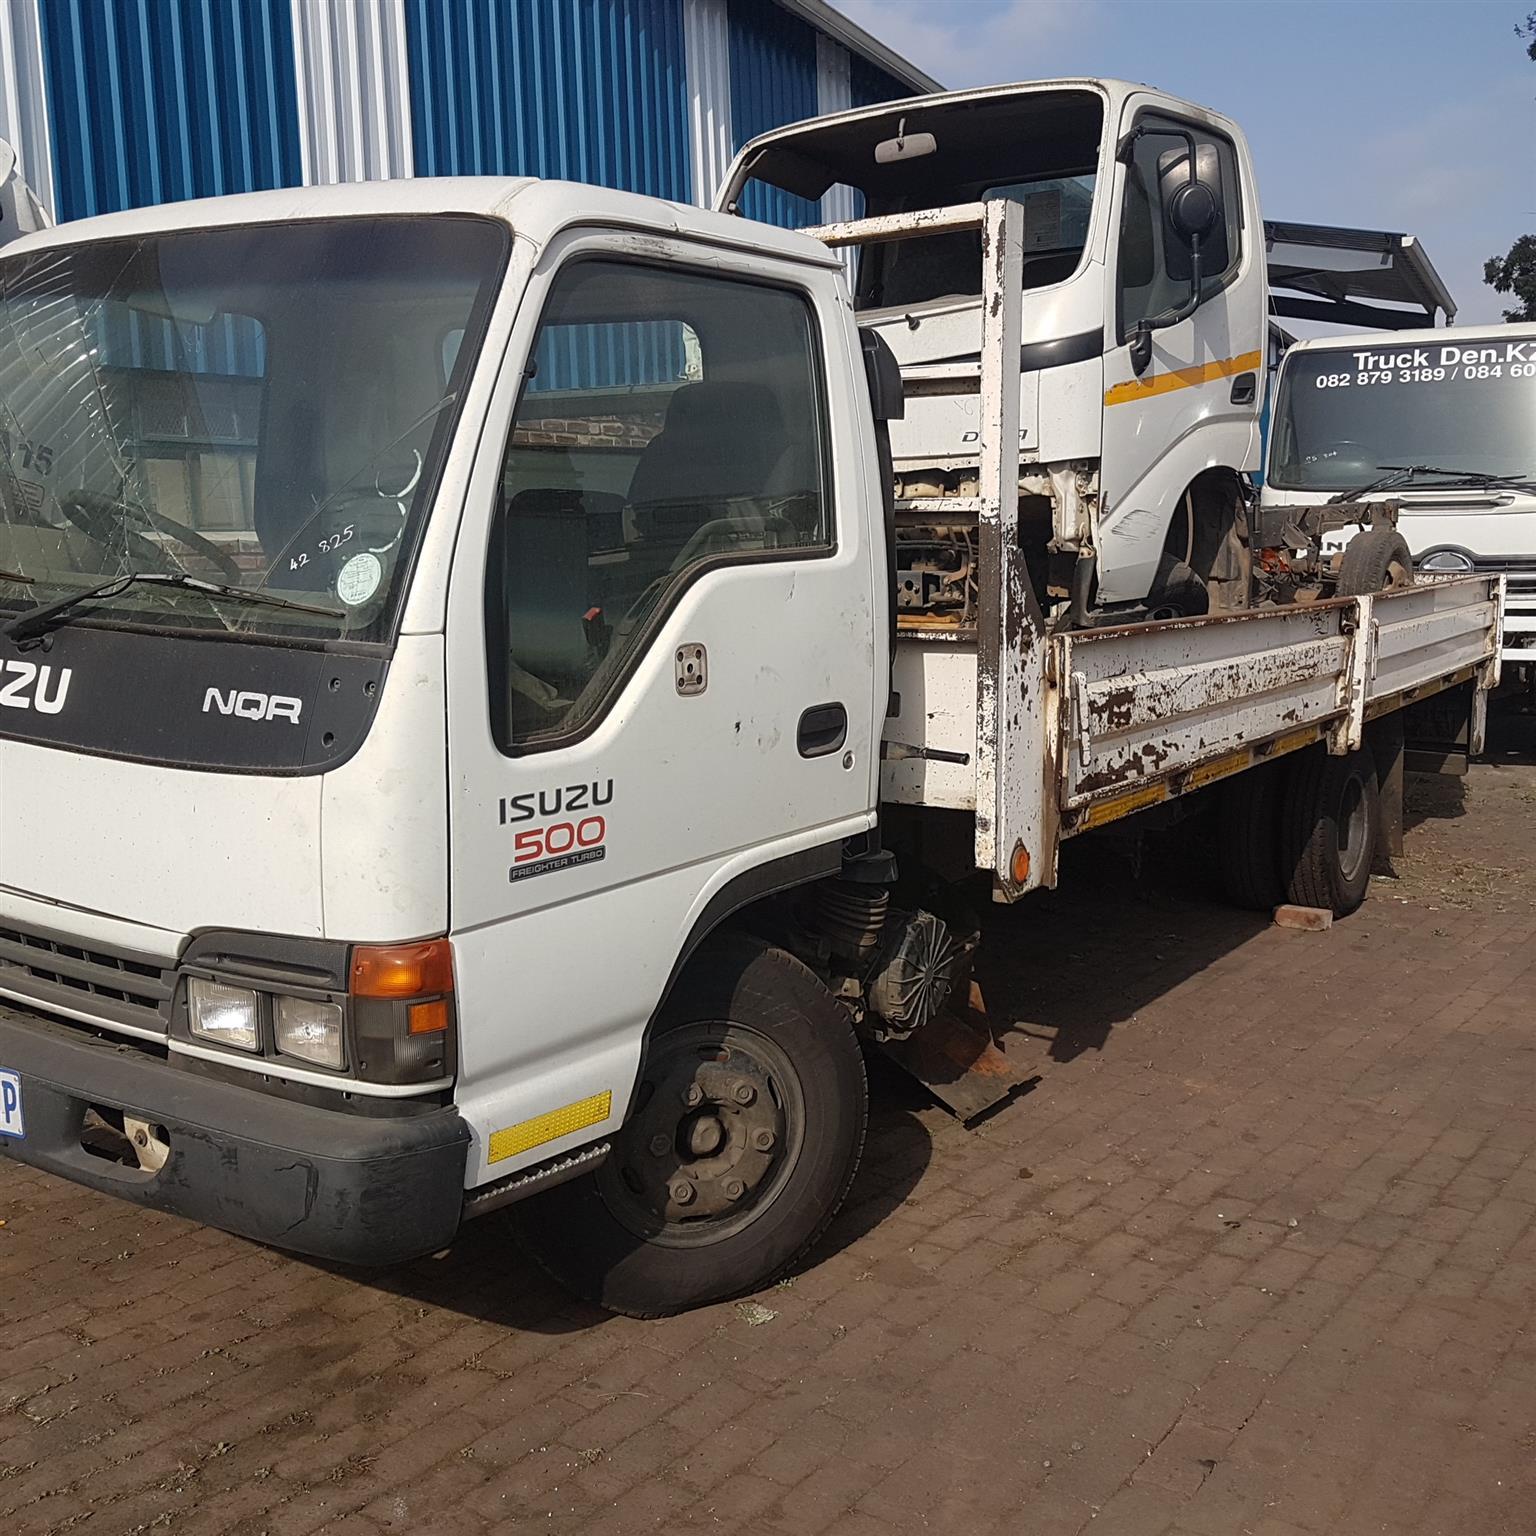 Isuzu Nqr 500 Truck Stripping 4 Spares 4he1t Engine 6 Sp Gear 4he1 Diagram Box